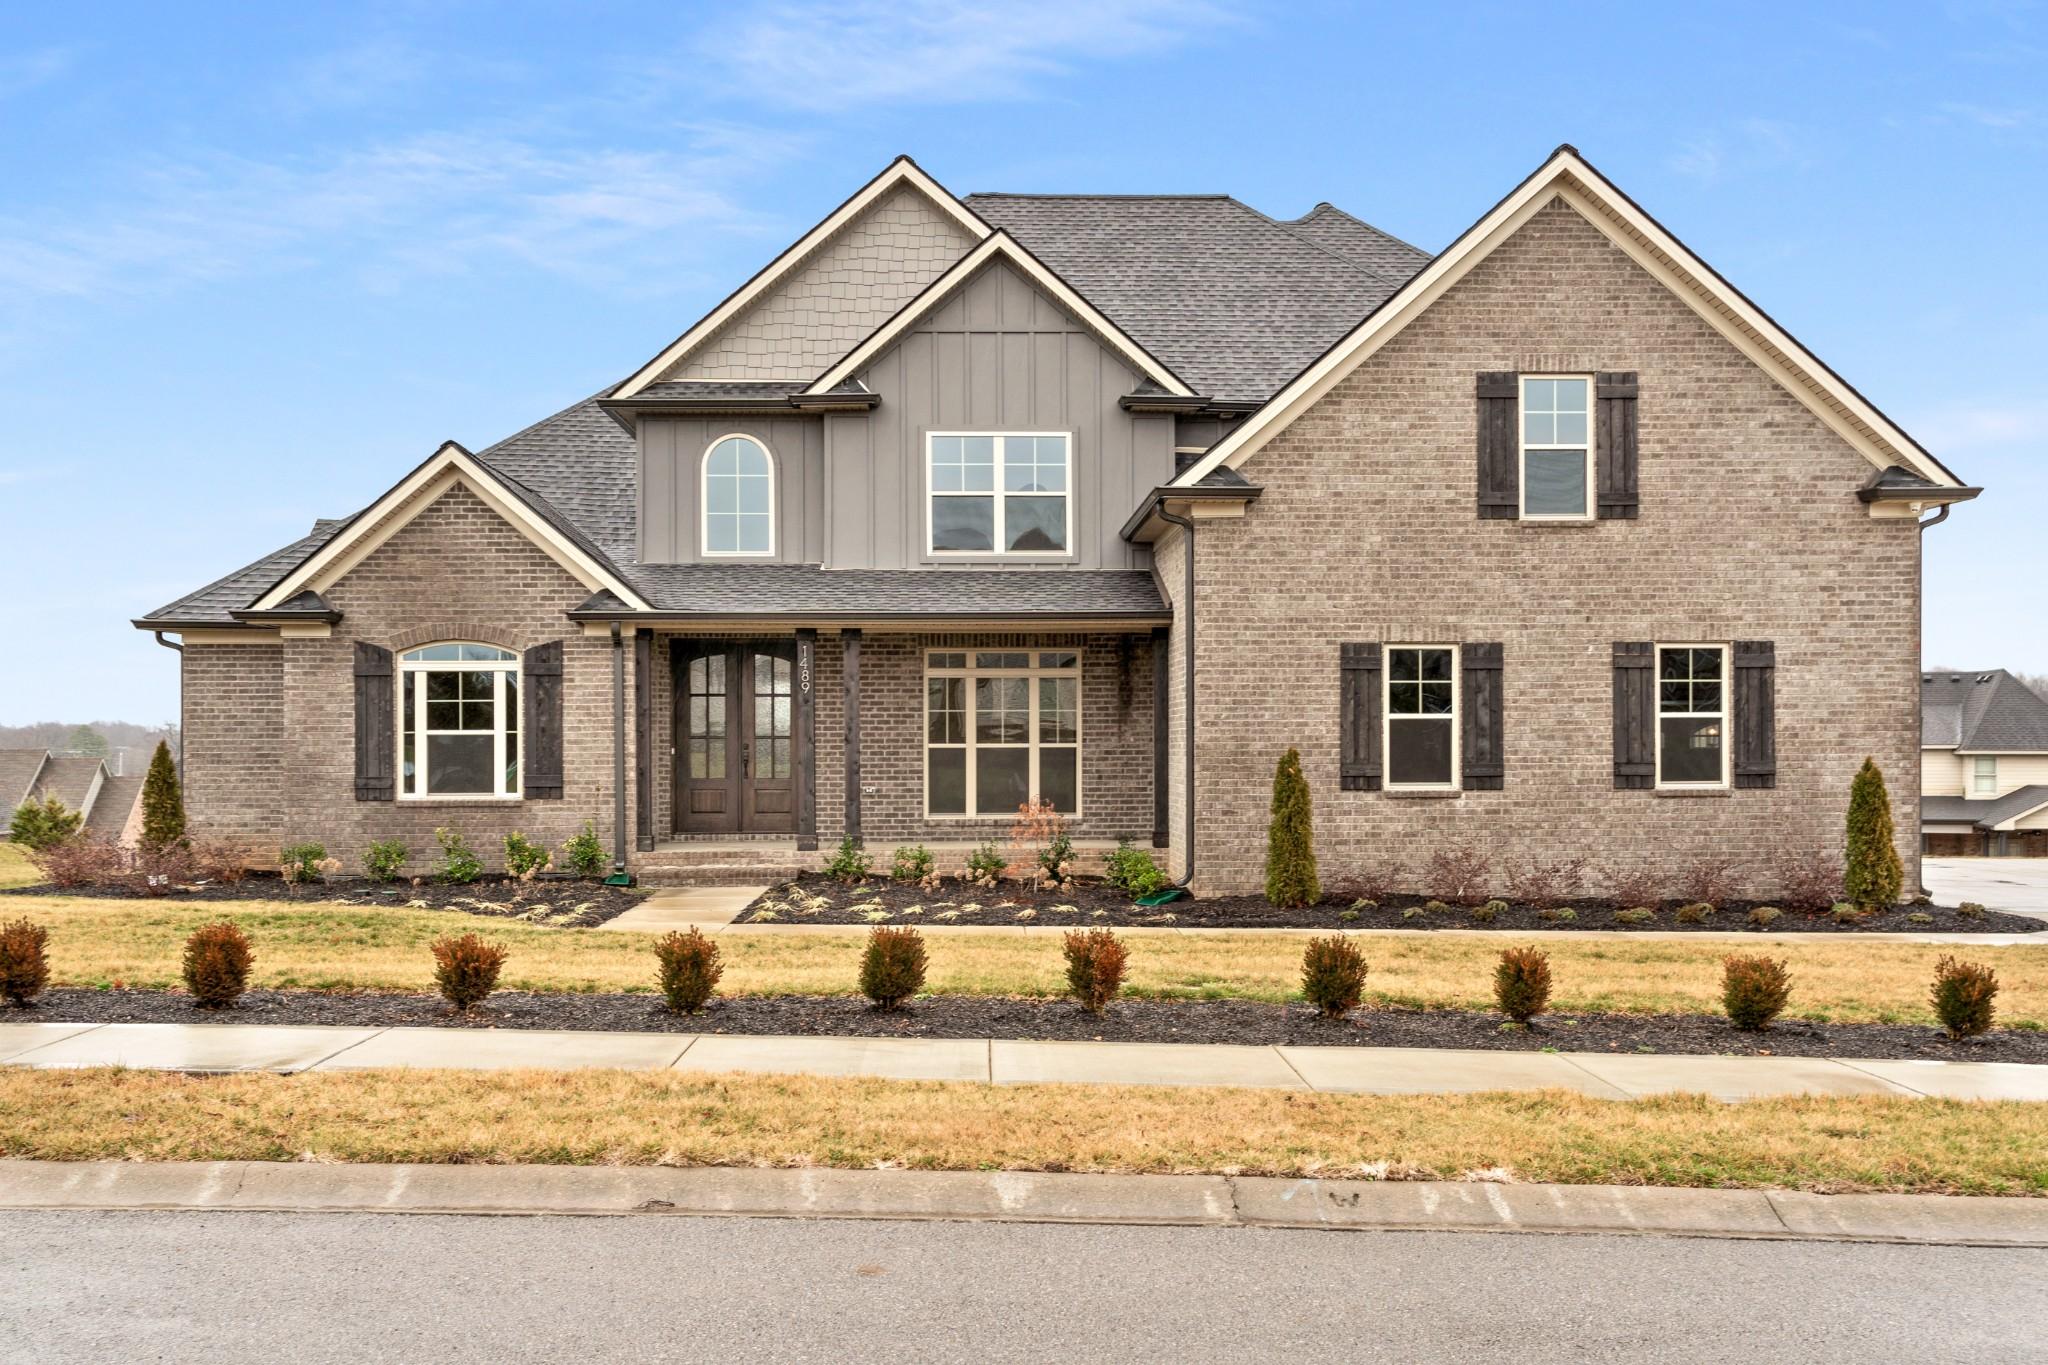 1489 Overlook Pointe, Clarksville, TN 37043 - Clarksville, TN real estate listing